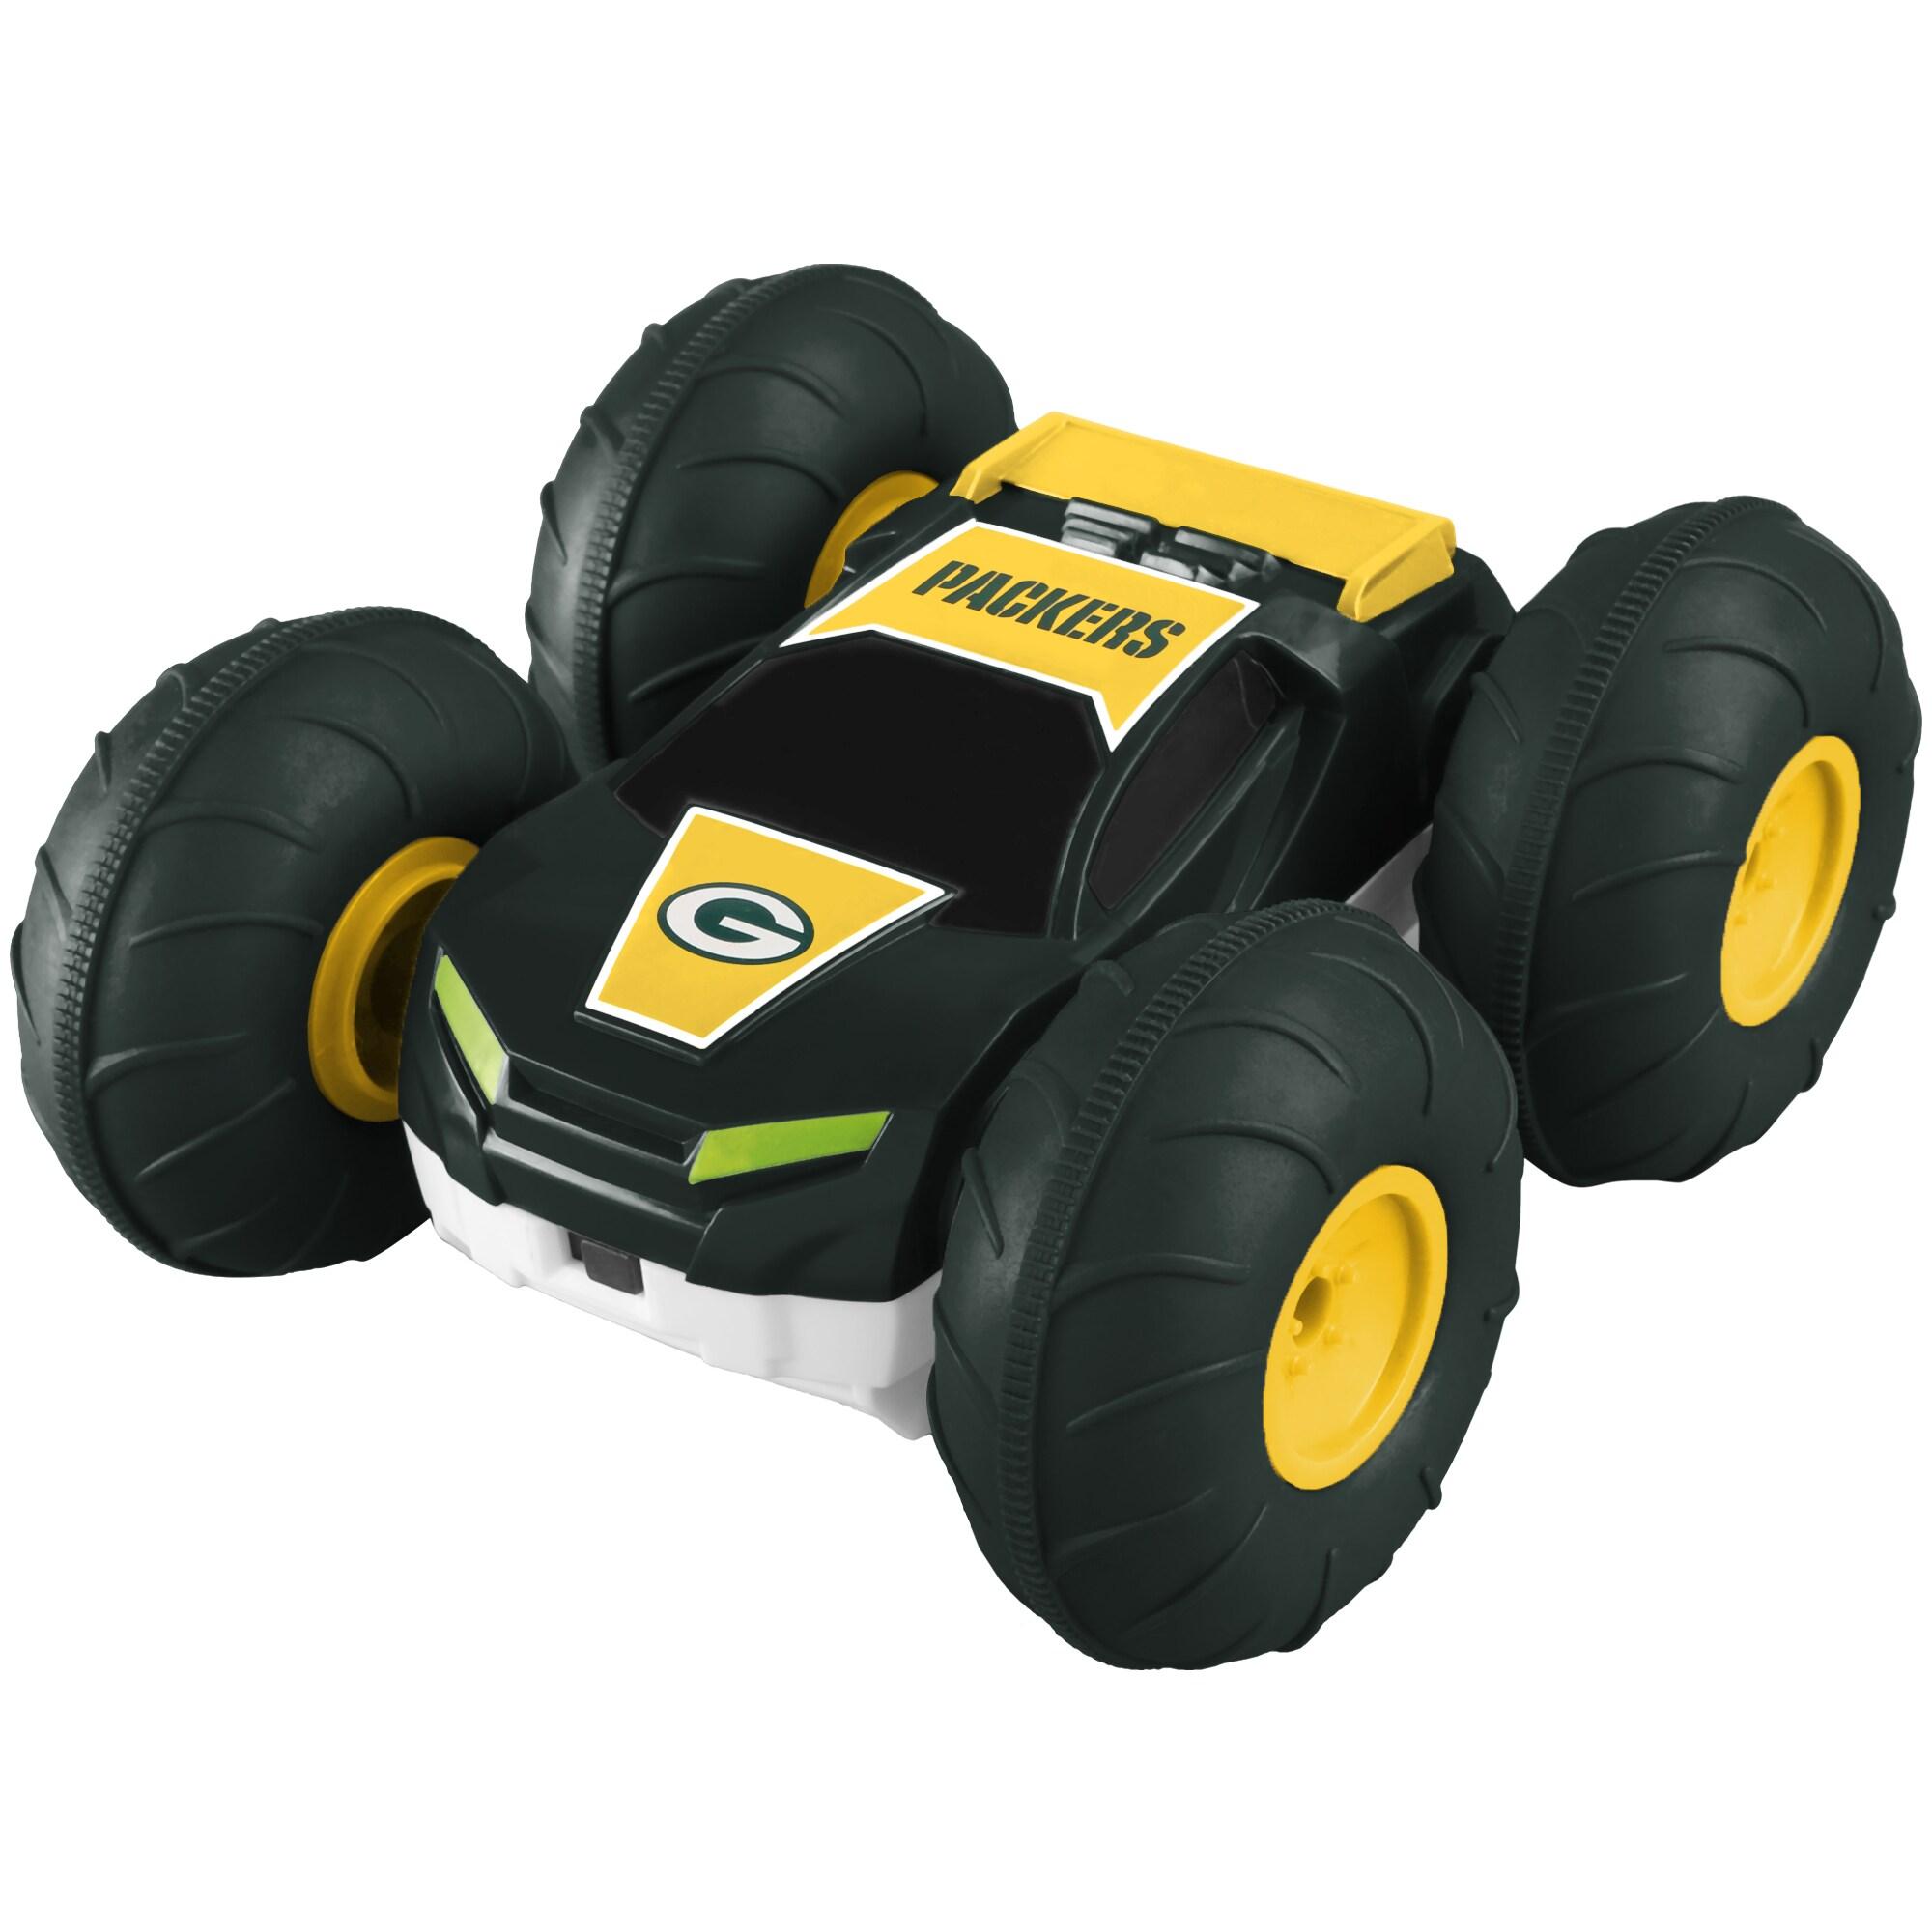 Green Bay Packers Flip Racer Stunt Car